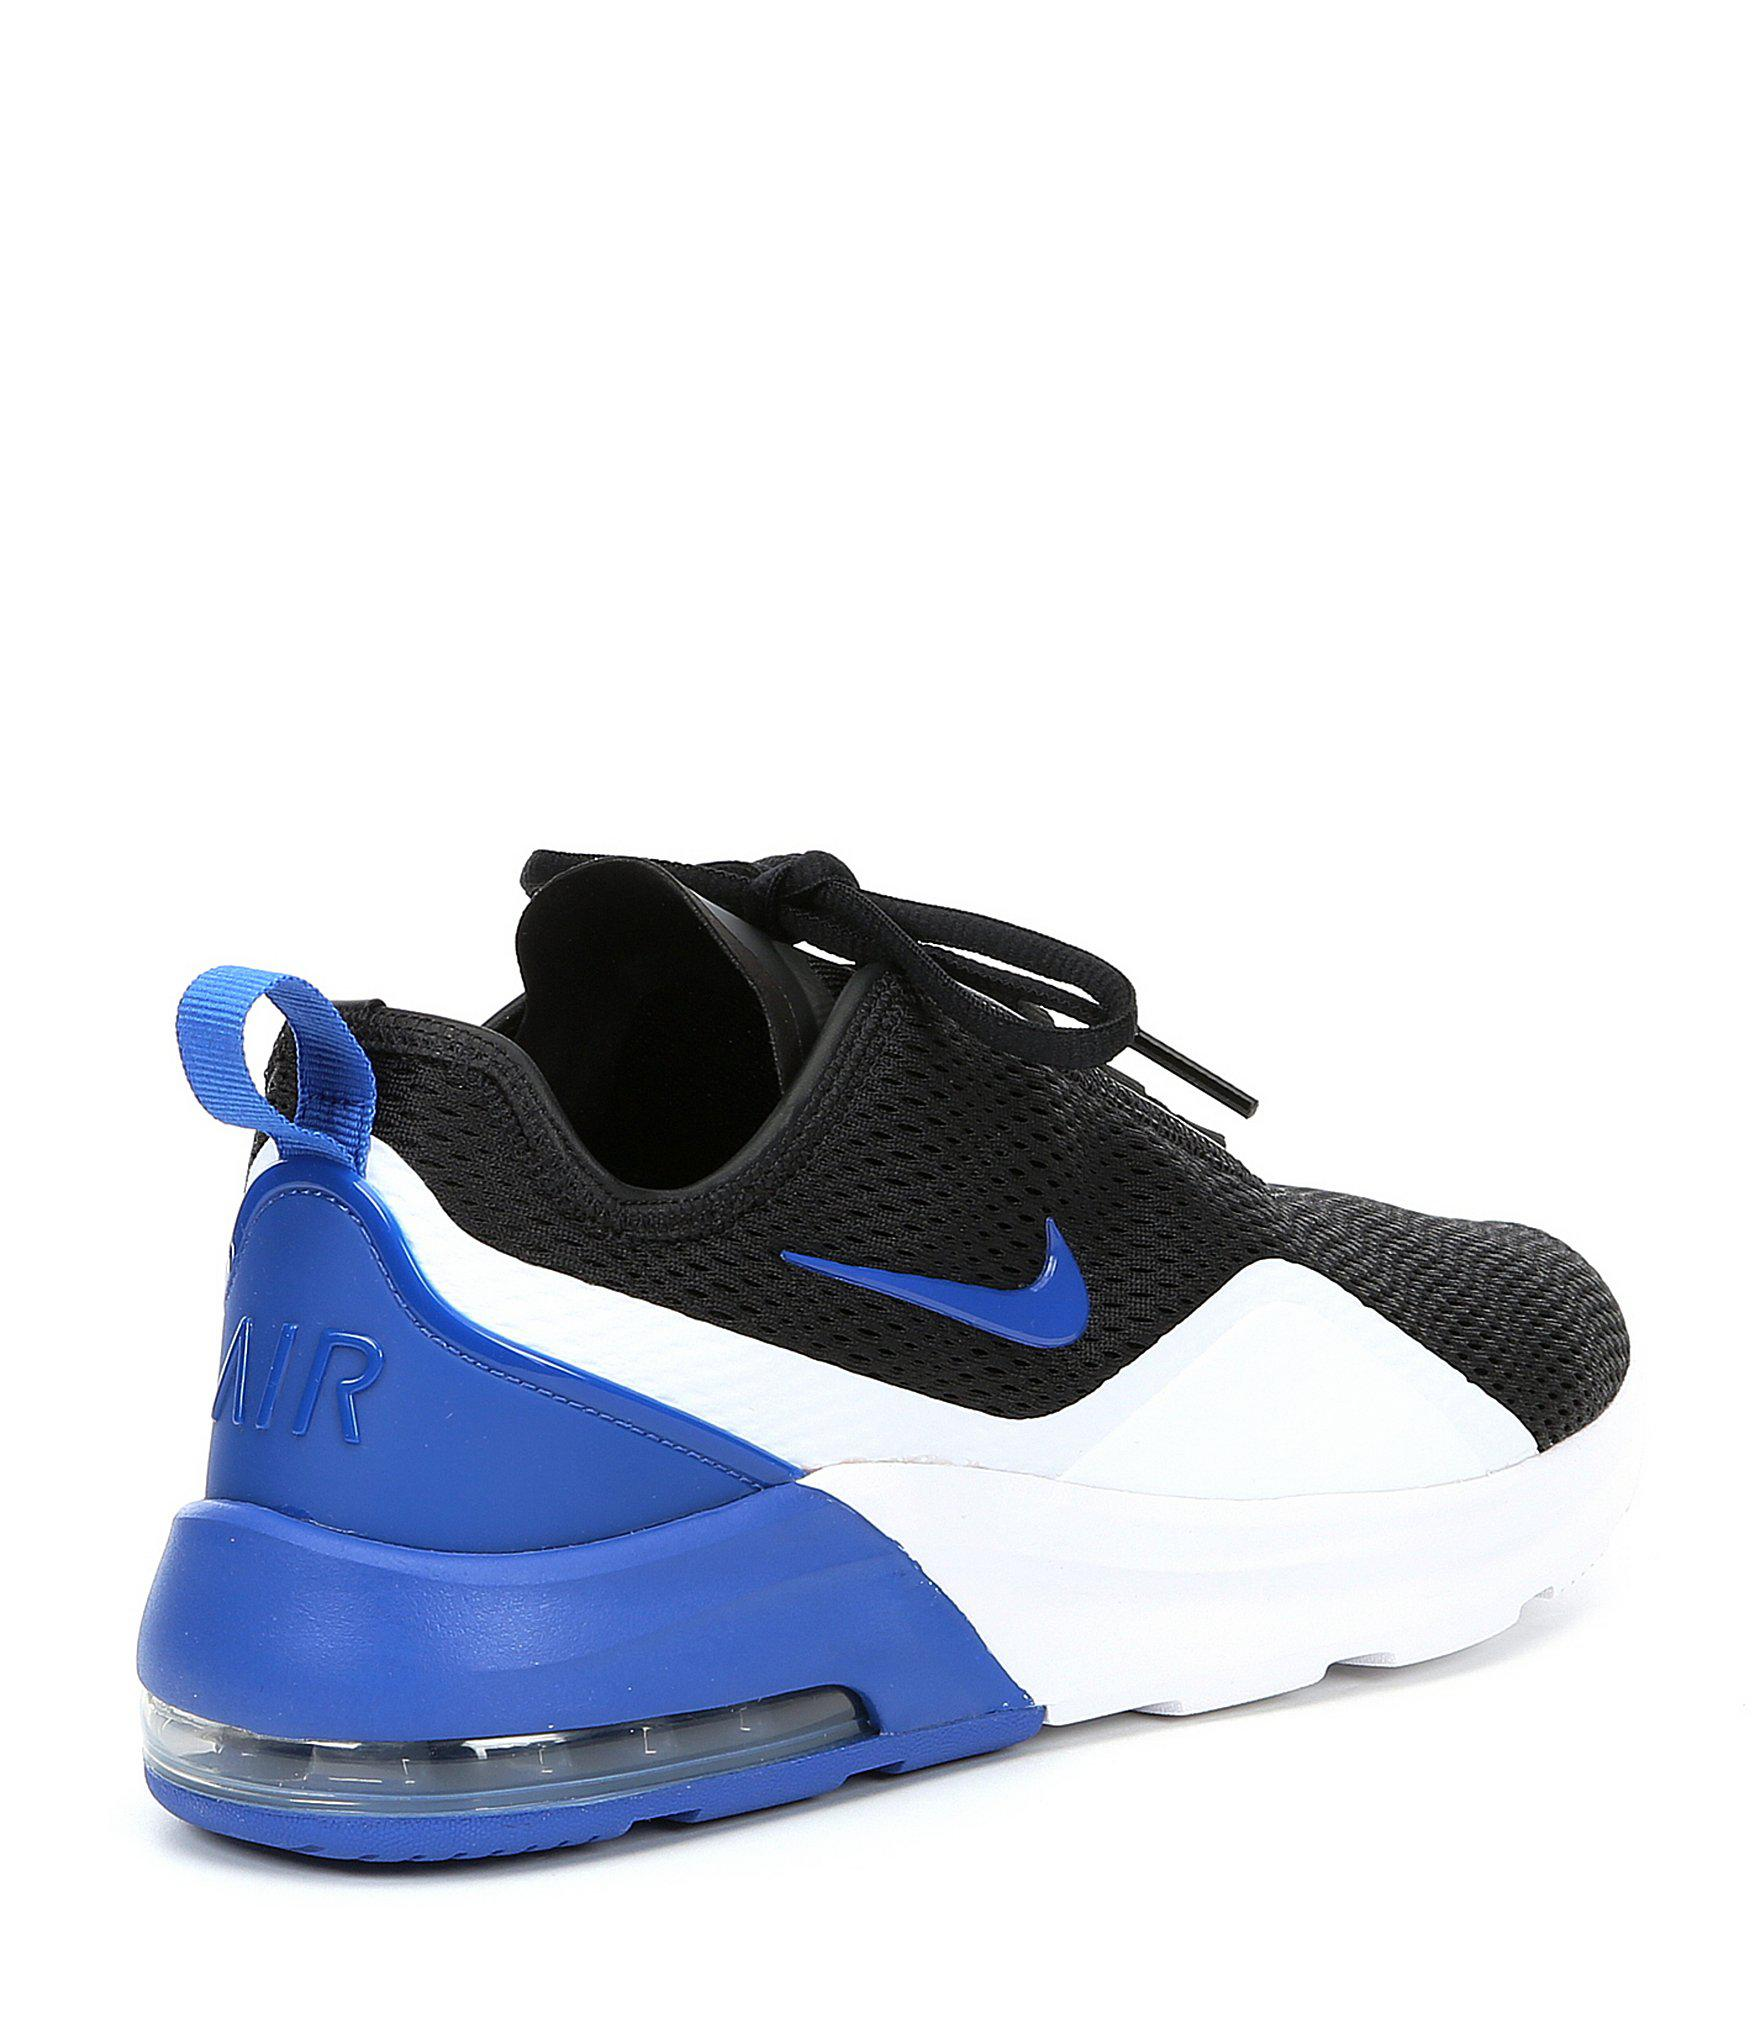 size 40 2c999 5a649 Nike - Black Men s Air Max Motion 2 Lifestyle Shoe for Men - Lyst. View  fullscreen